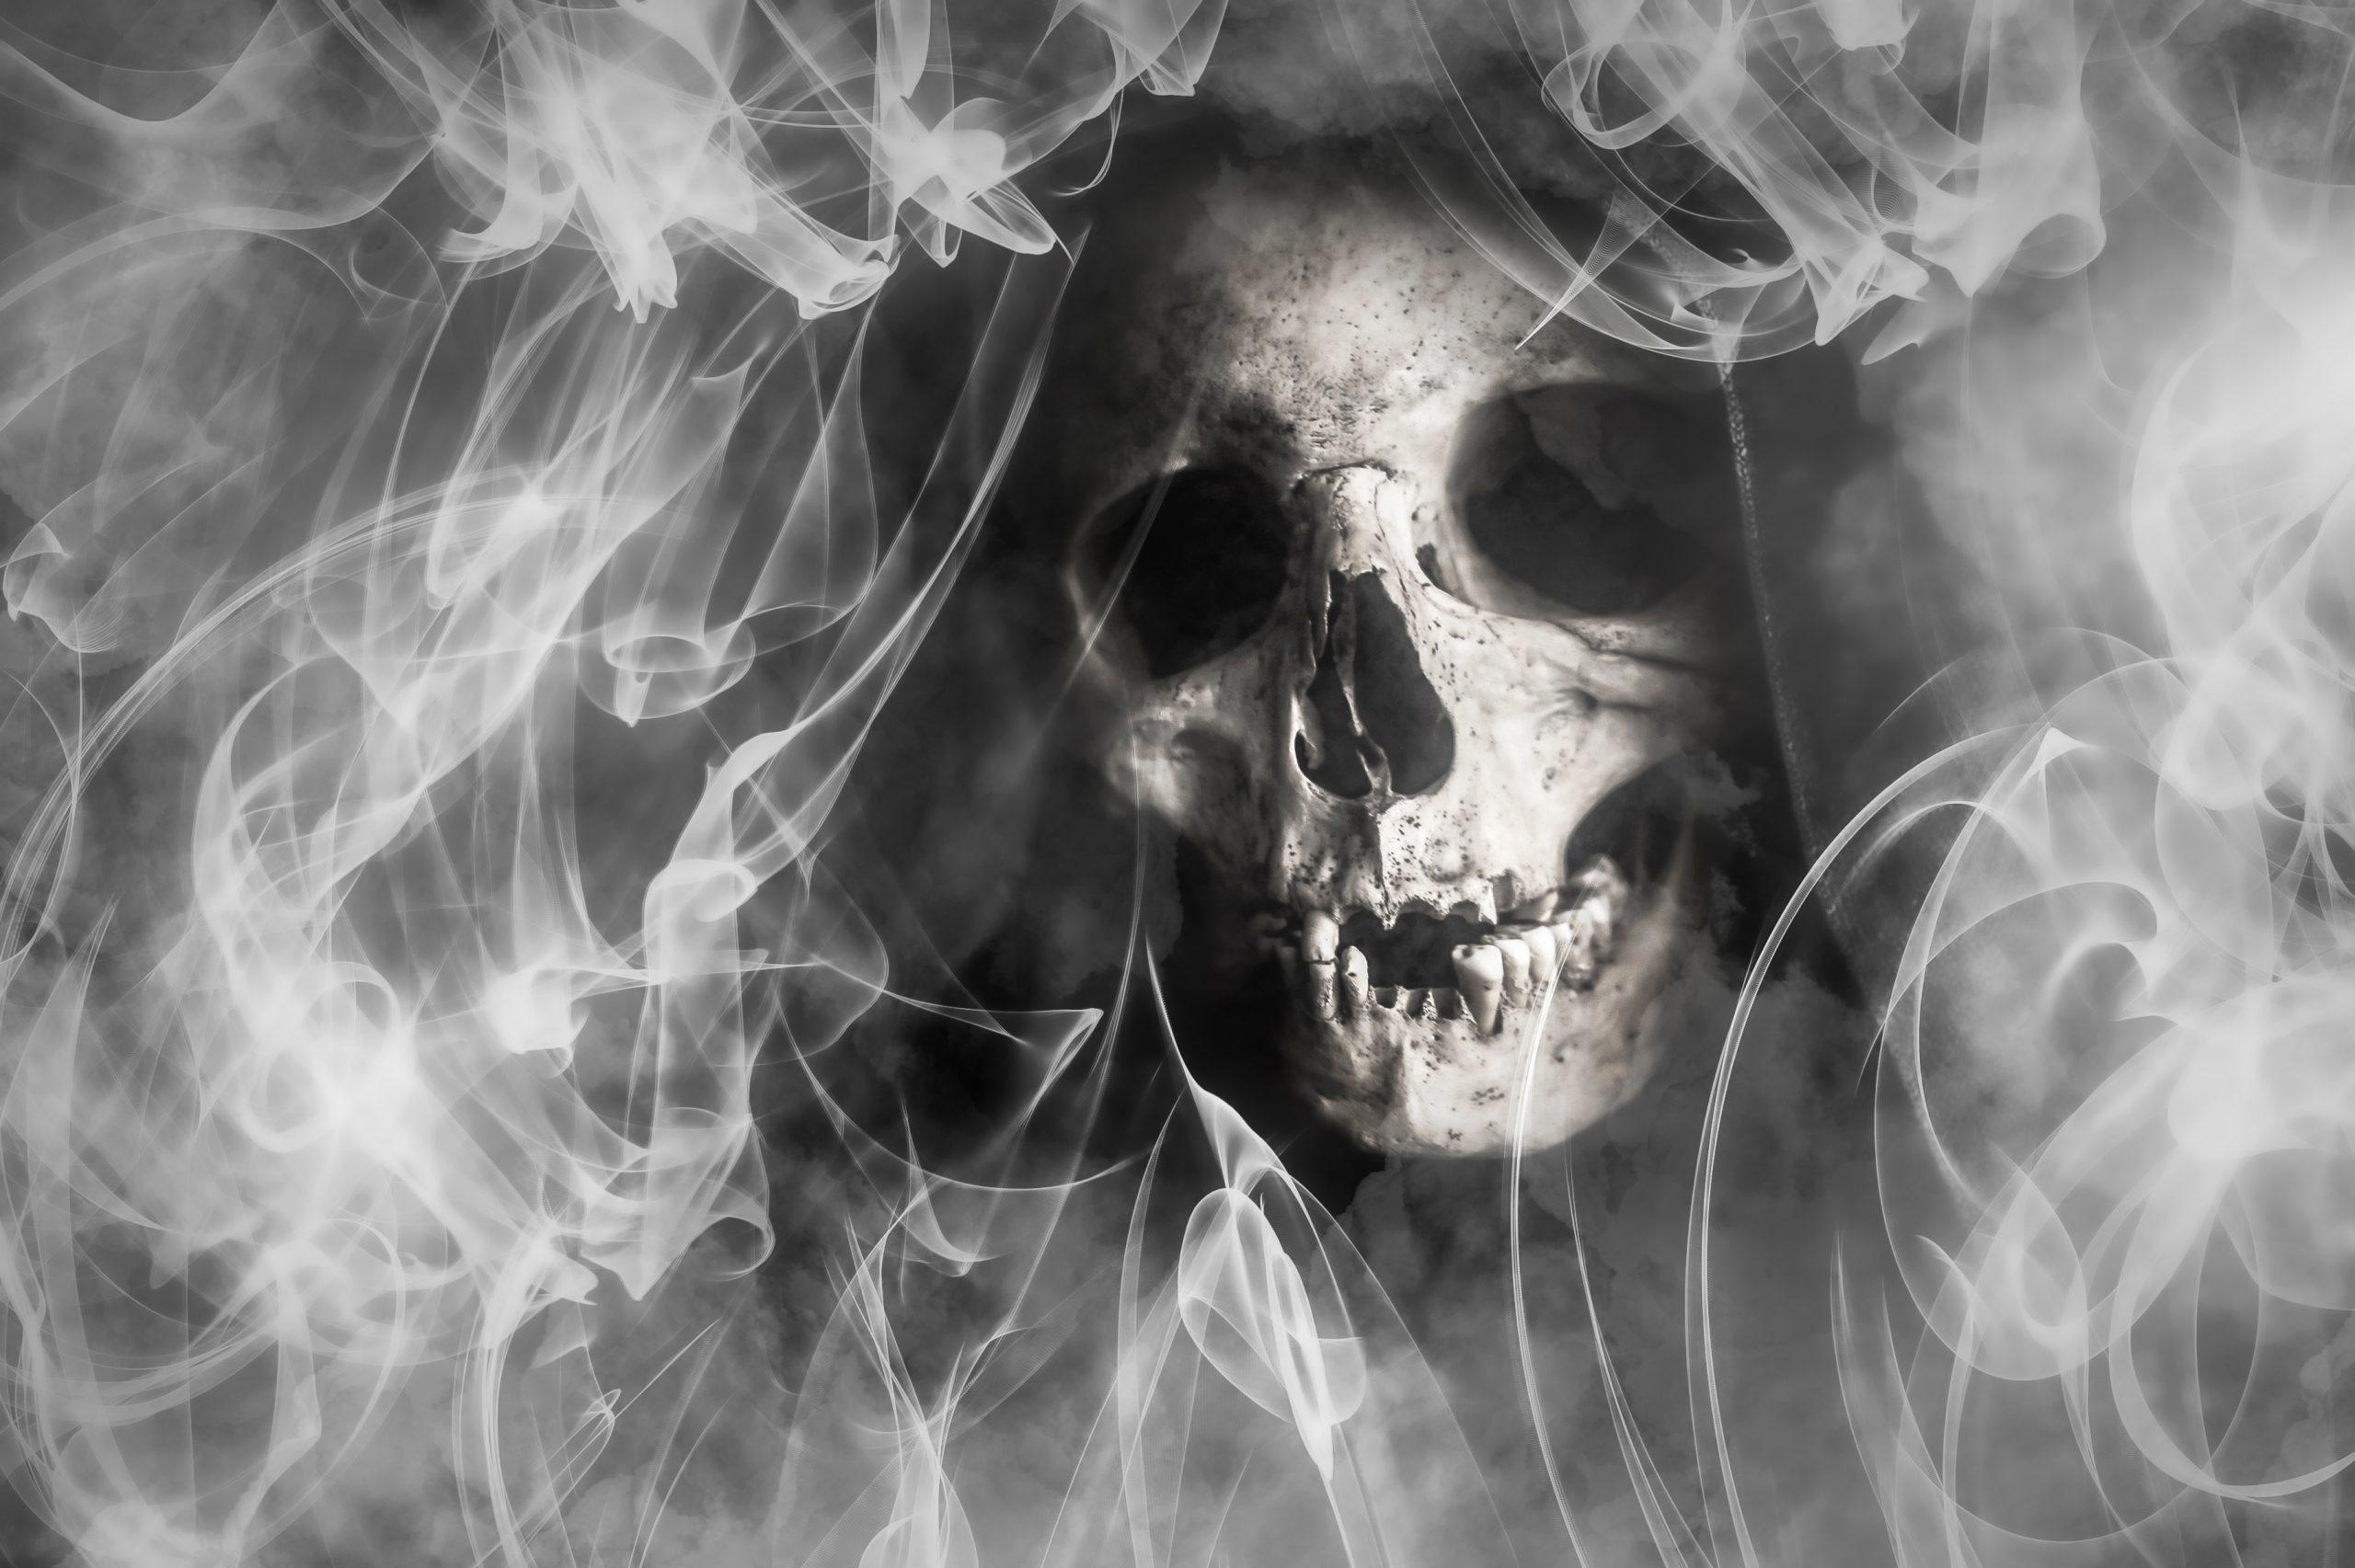 skull-image